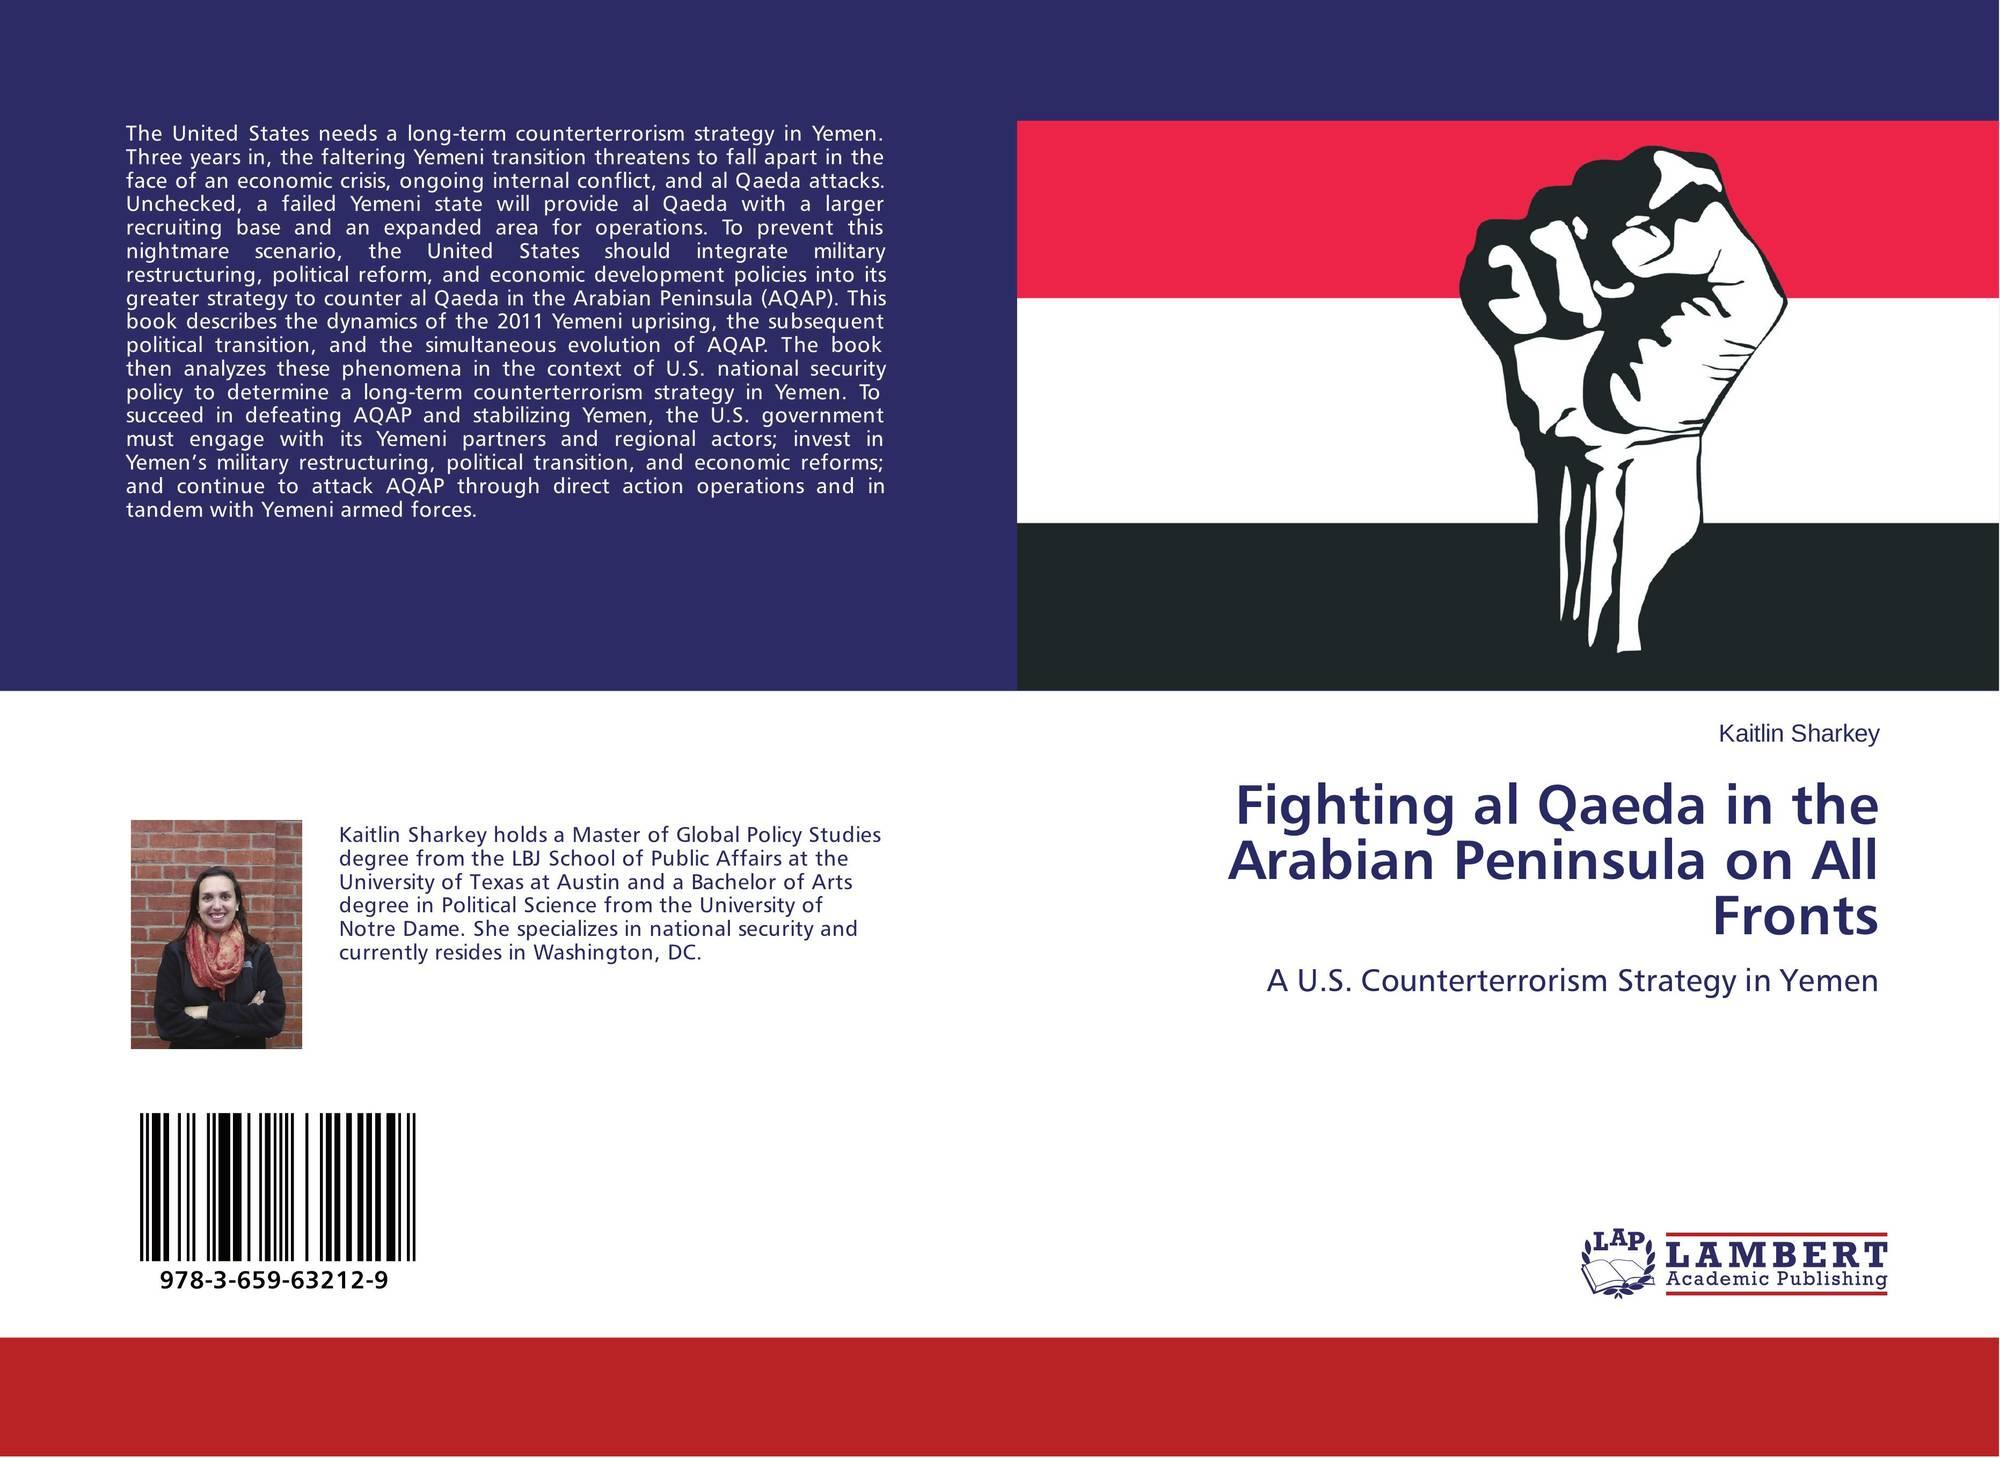 Fighting al Qaeda in the Arabian Peninsula on All Fronts